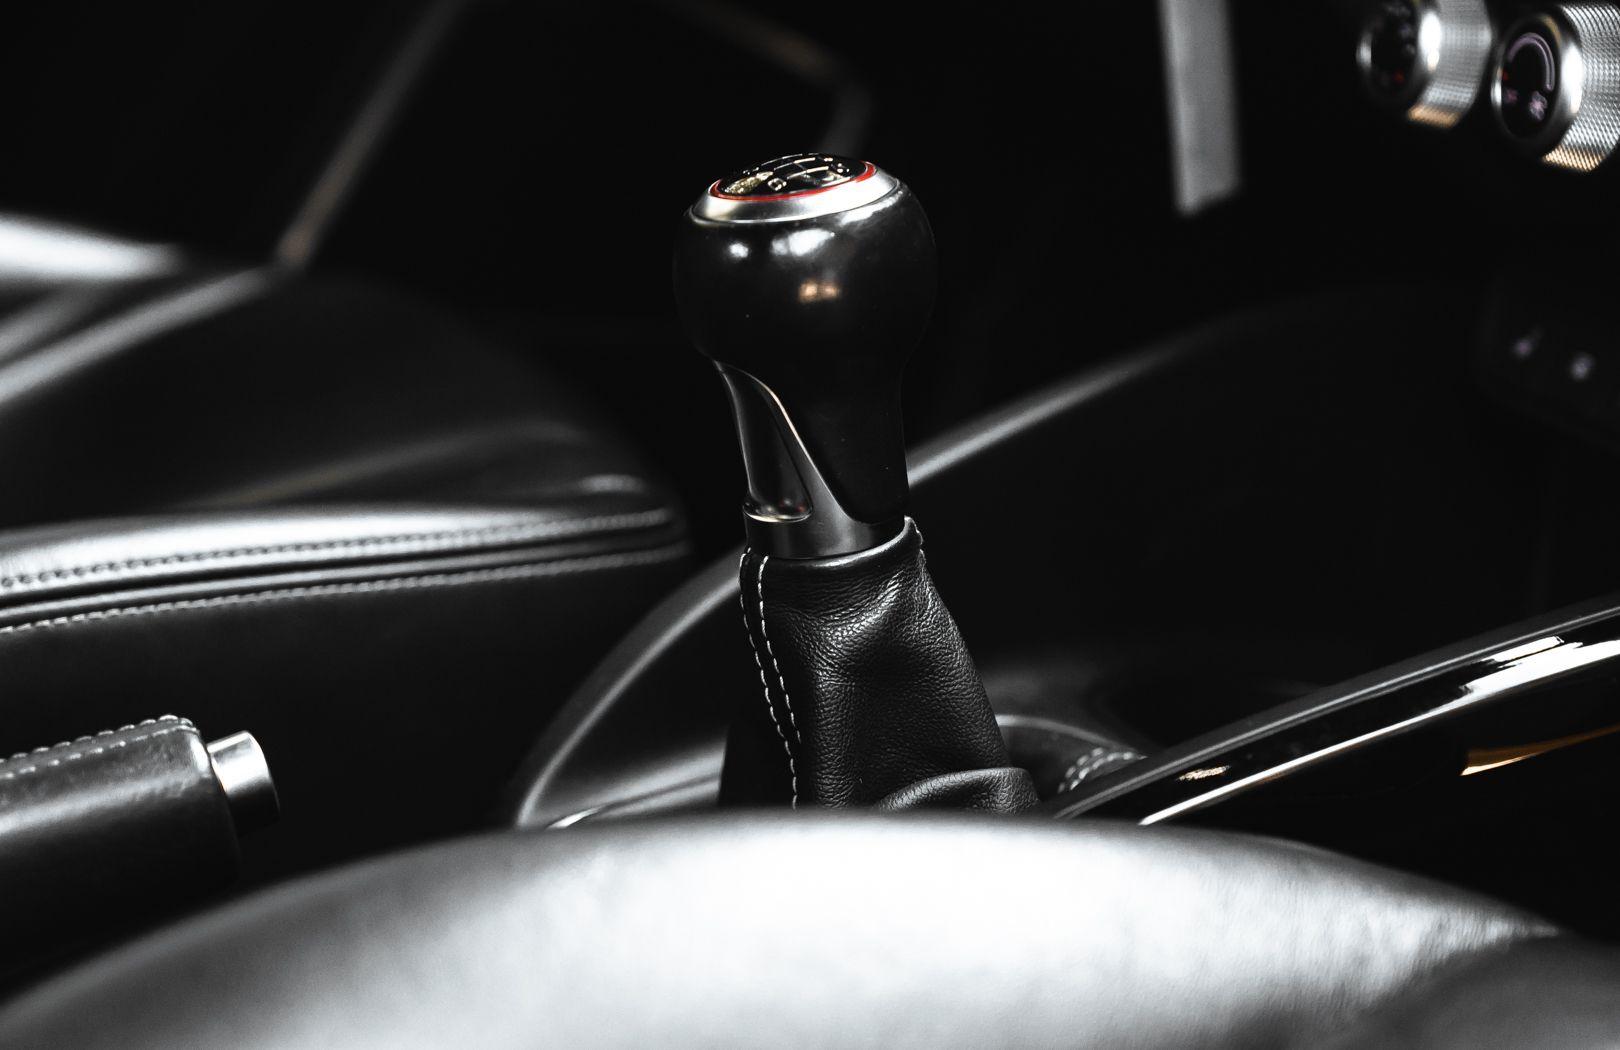 2014 Audi S1 Sportback 2.0 TFSI Quattro 83641